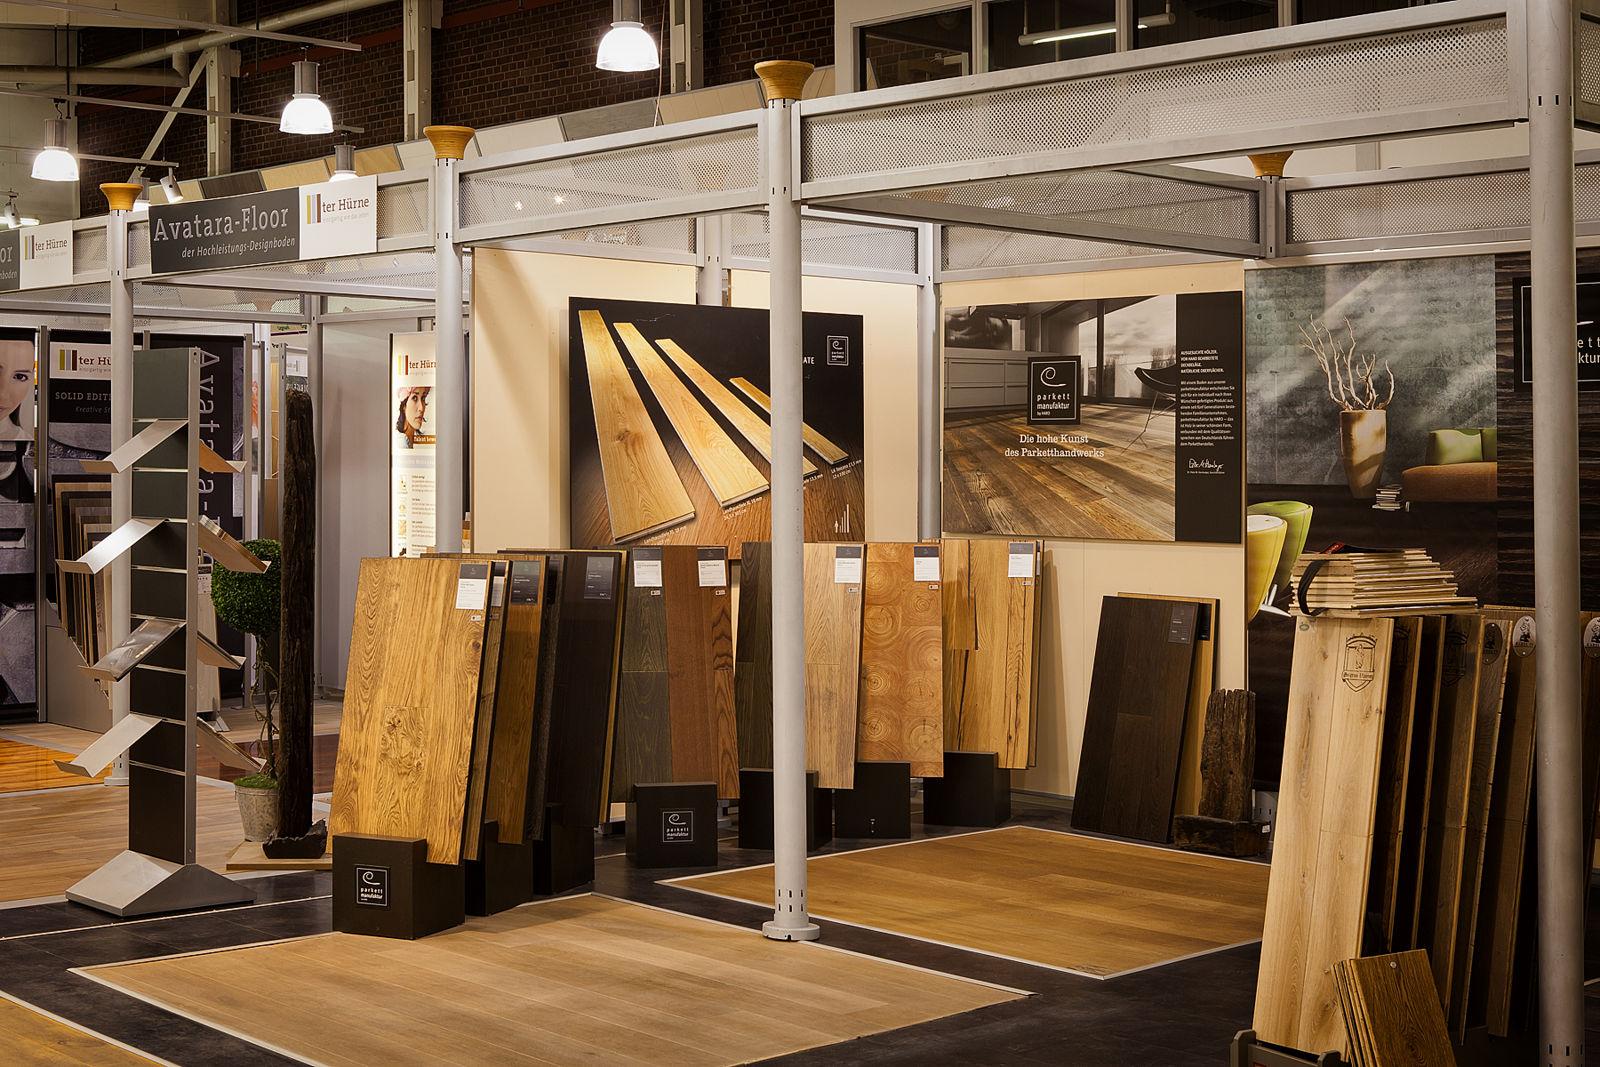 fotogalerie unser unternehmen lignum holzfachmarkt m nster. Black Bedroom Furniture Sets. Home Design Ideas